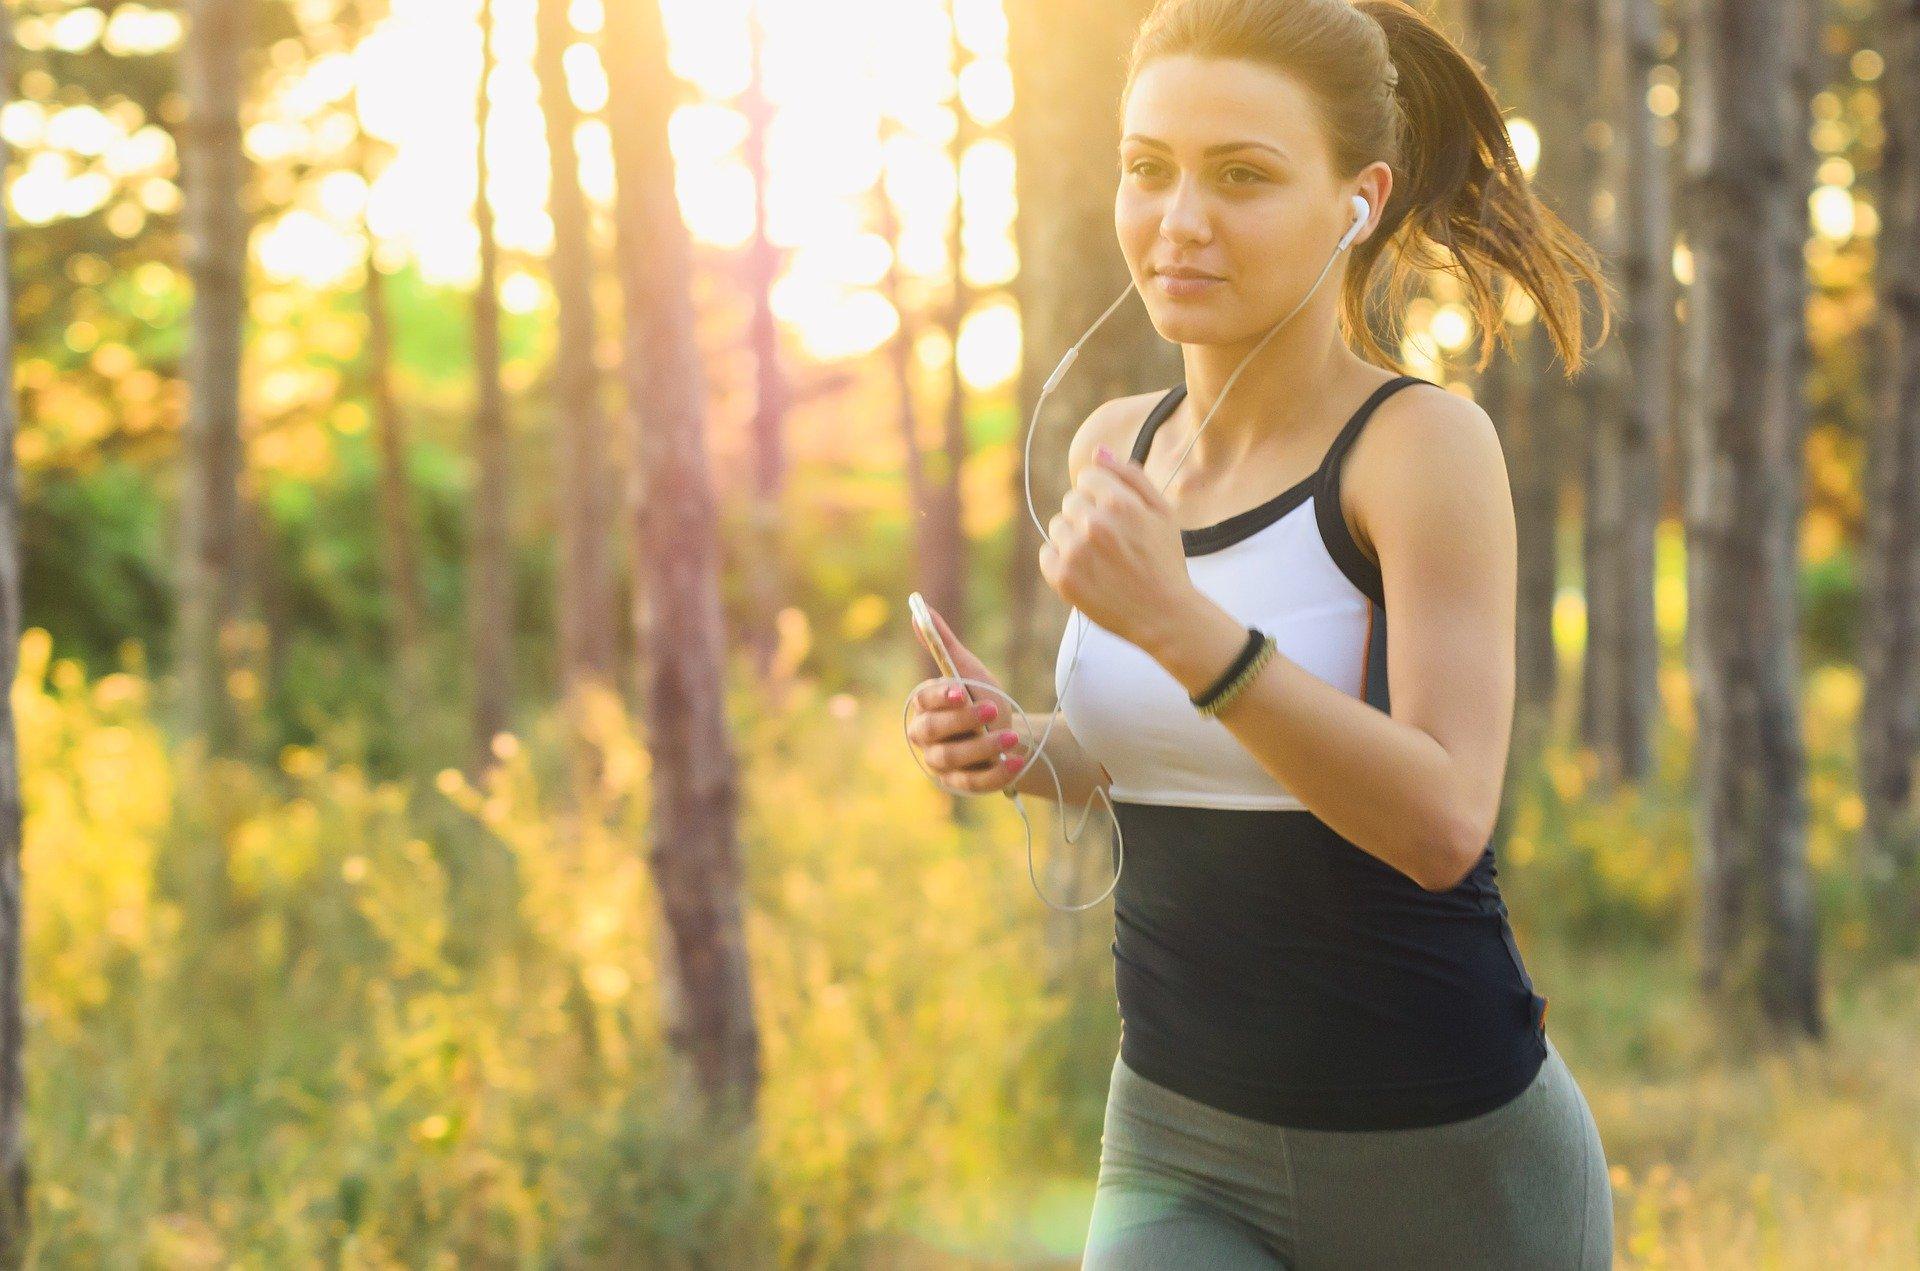 Girl running through the forest